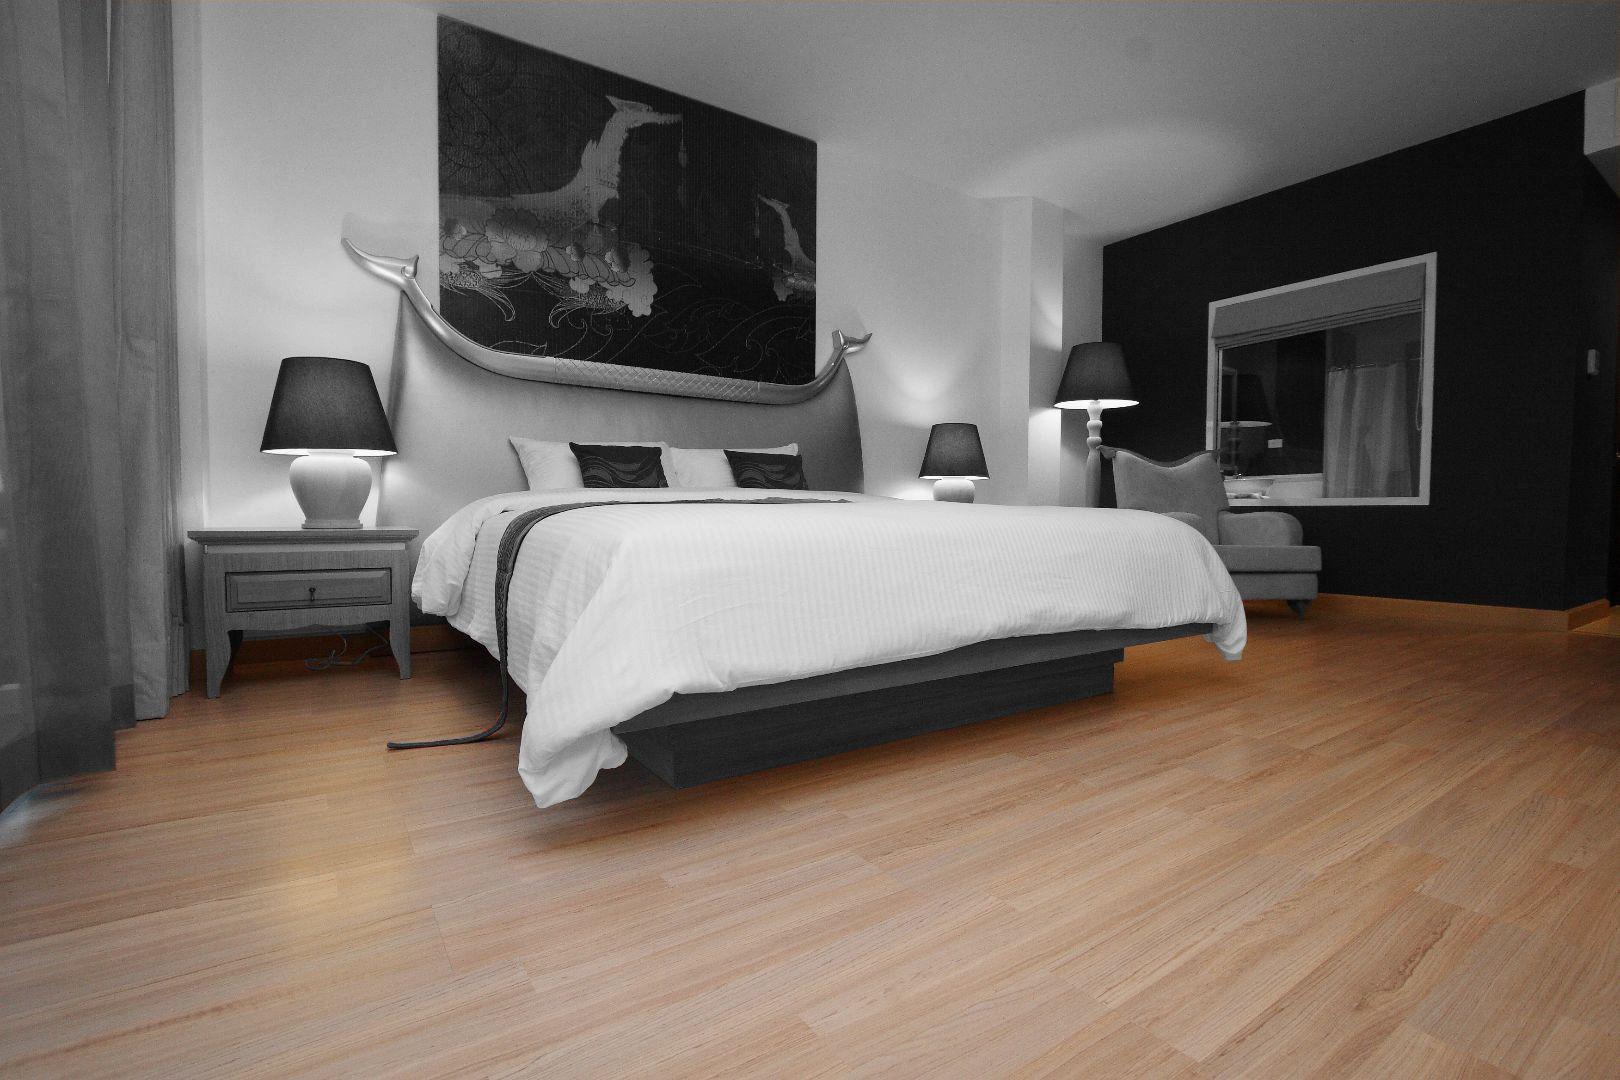 Light Brown Laminated Wood Flooring In A Bedroom Unit Home Flooring Wood Floors